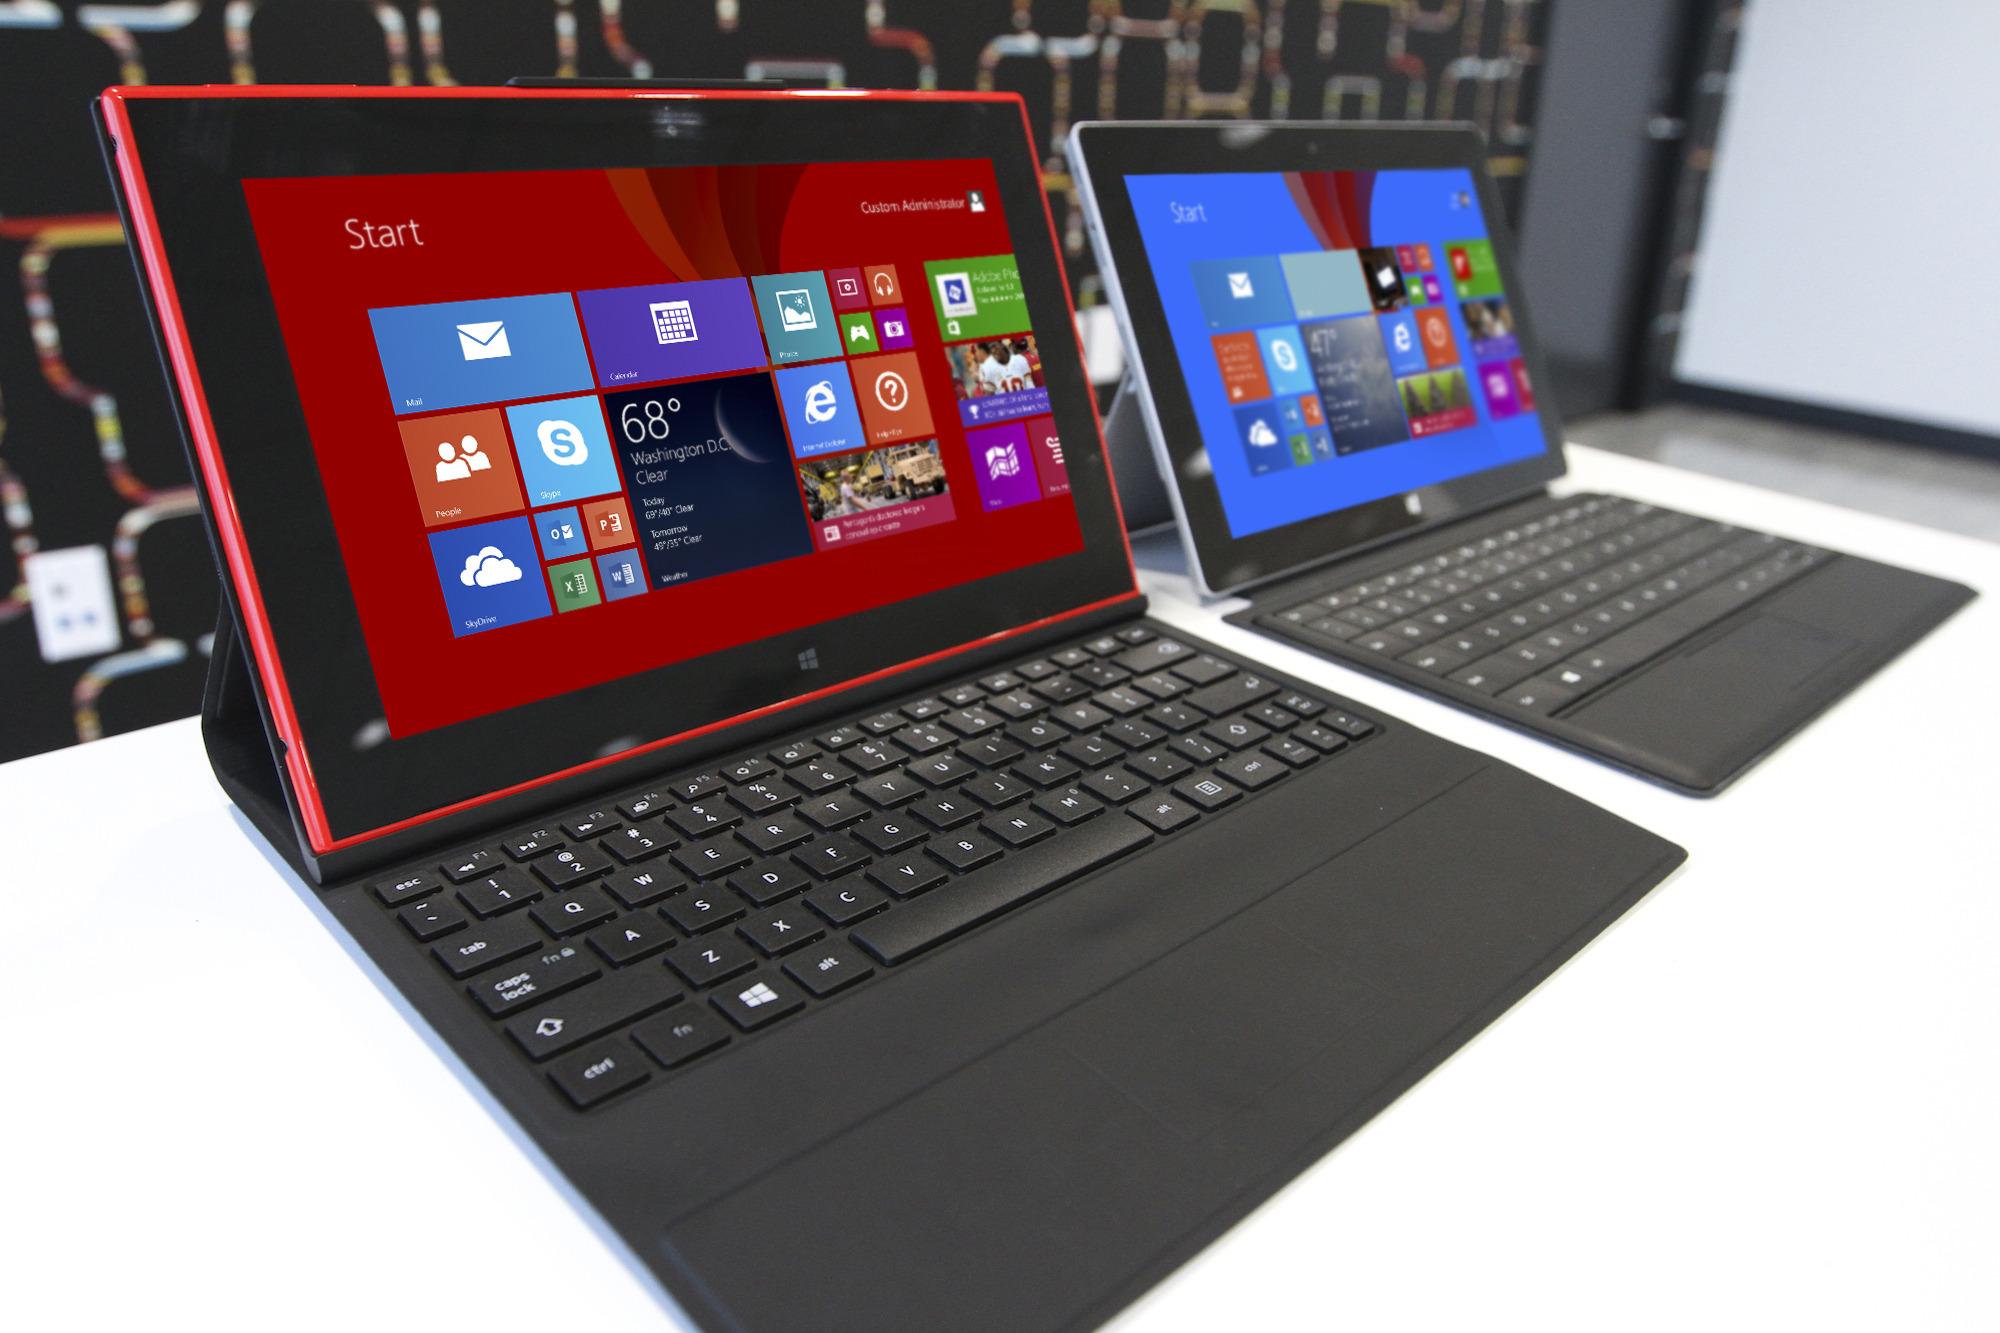 nokia lumia 2520 o acheter la tablette 4g meilleur mobile. Black Bedroom Furniture Sets. Home Design Ideas